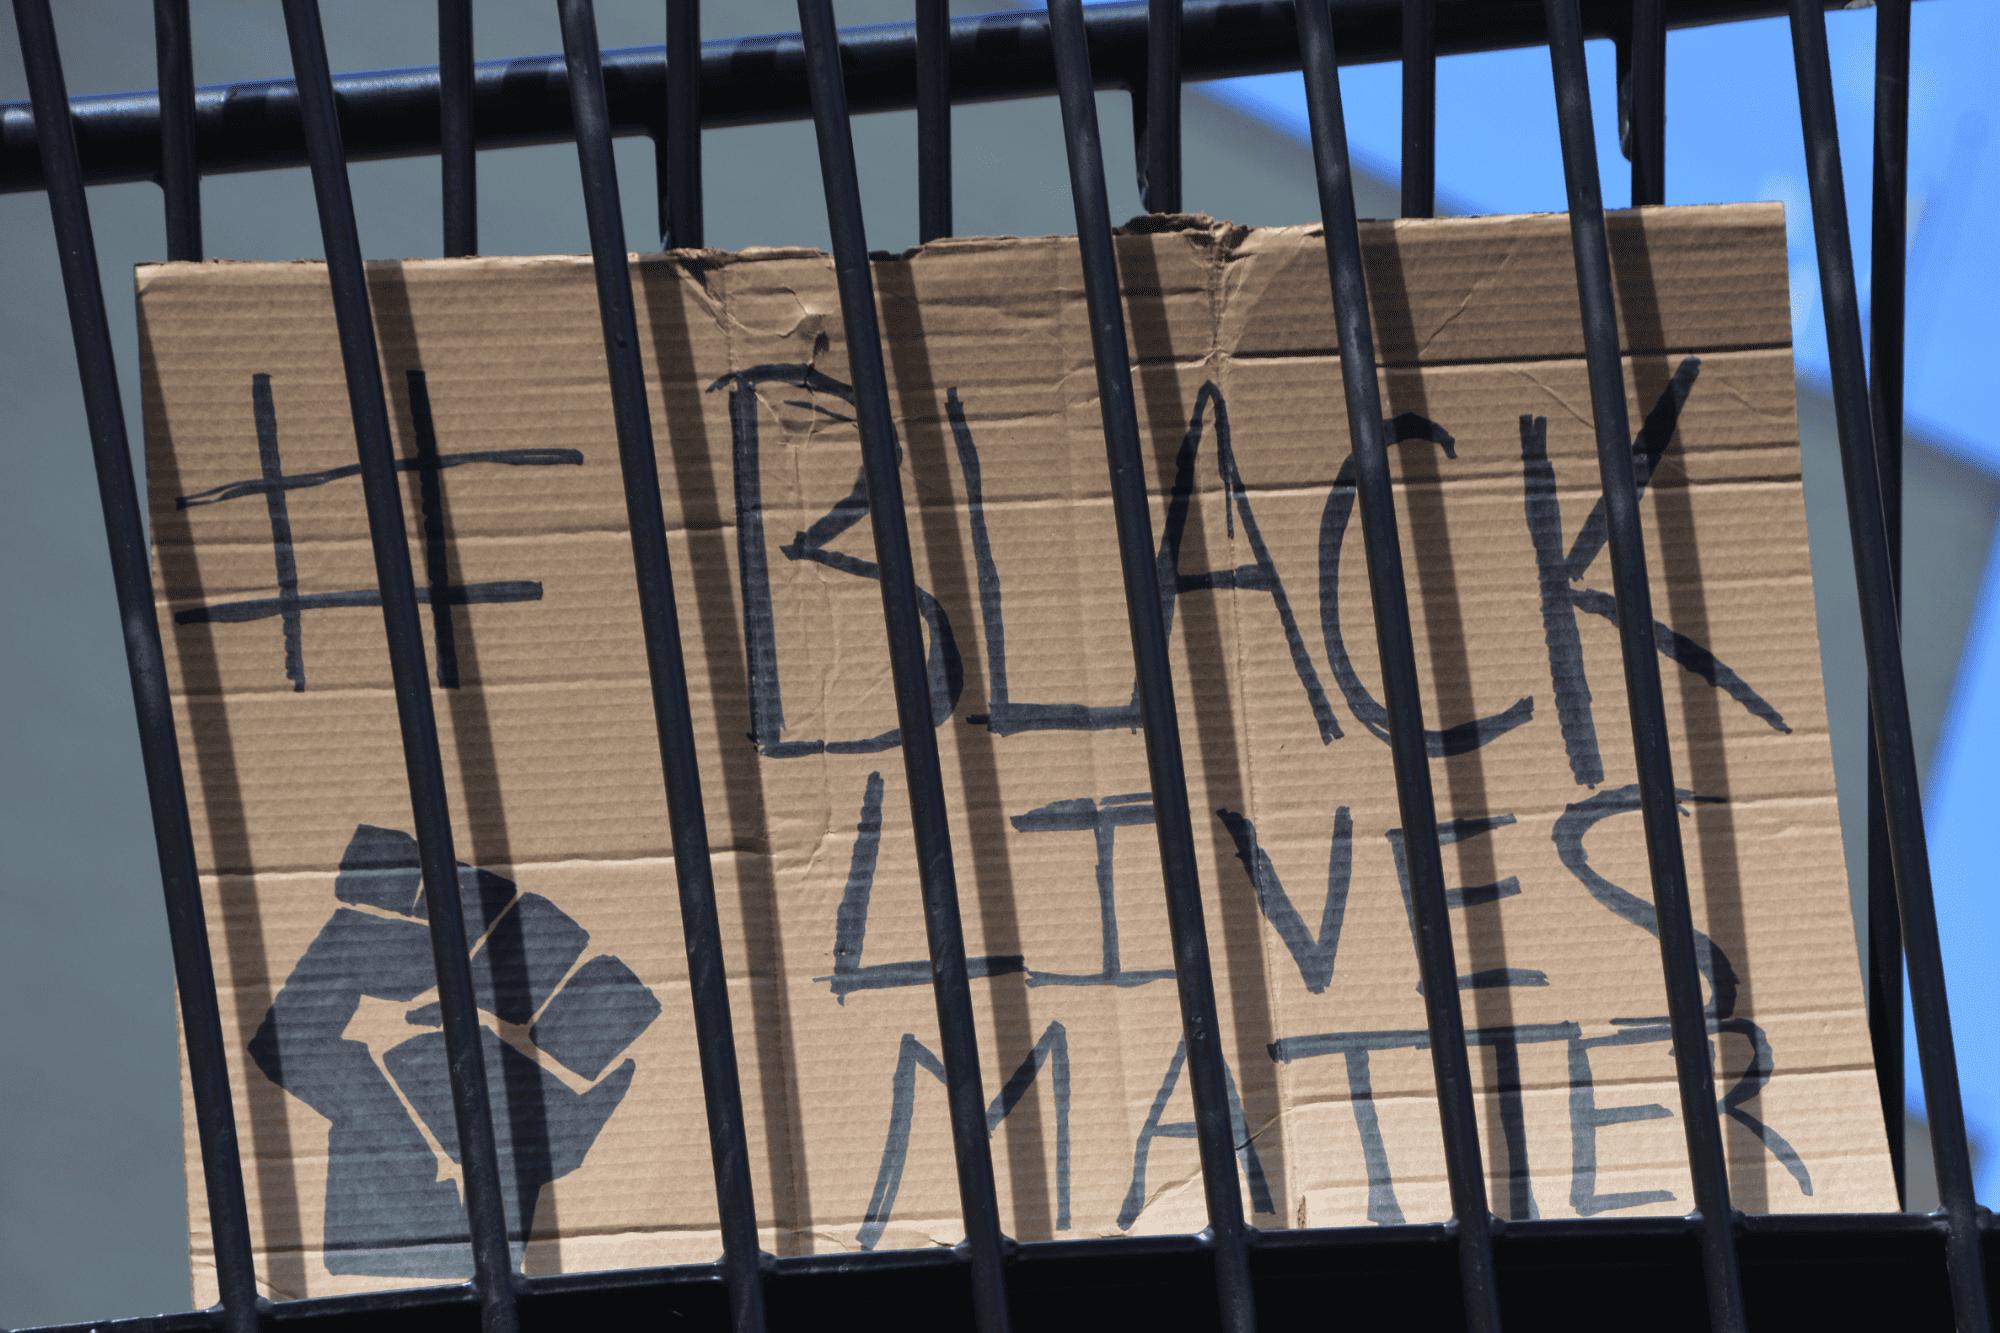 Anti-Black racism in Canadian prisons remains rampant, despite government pledges